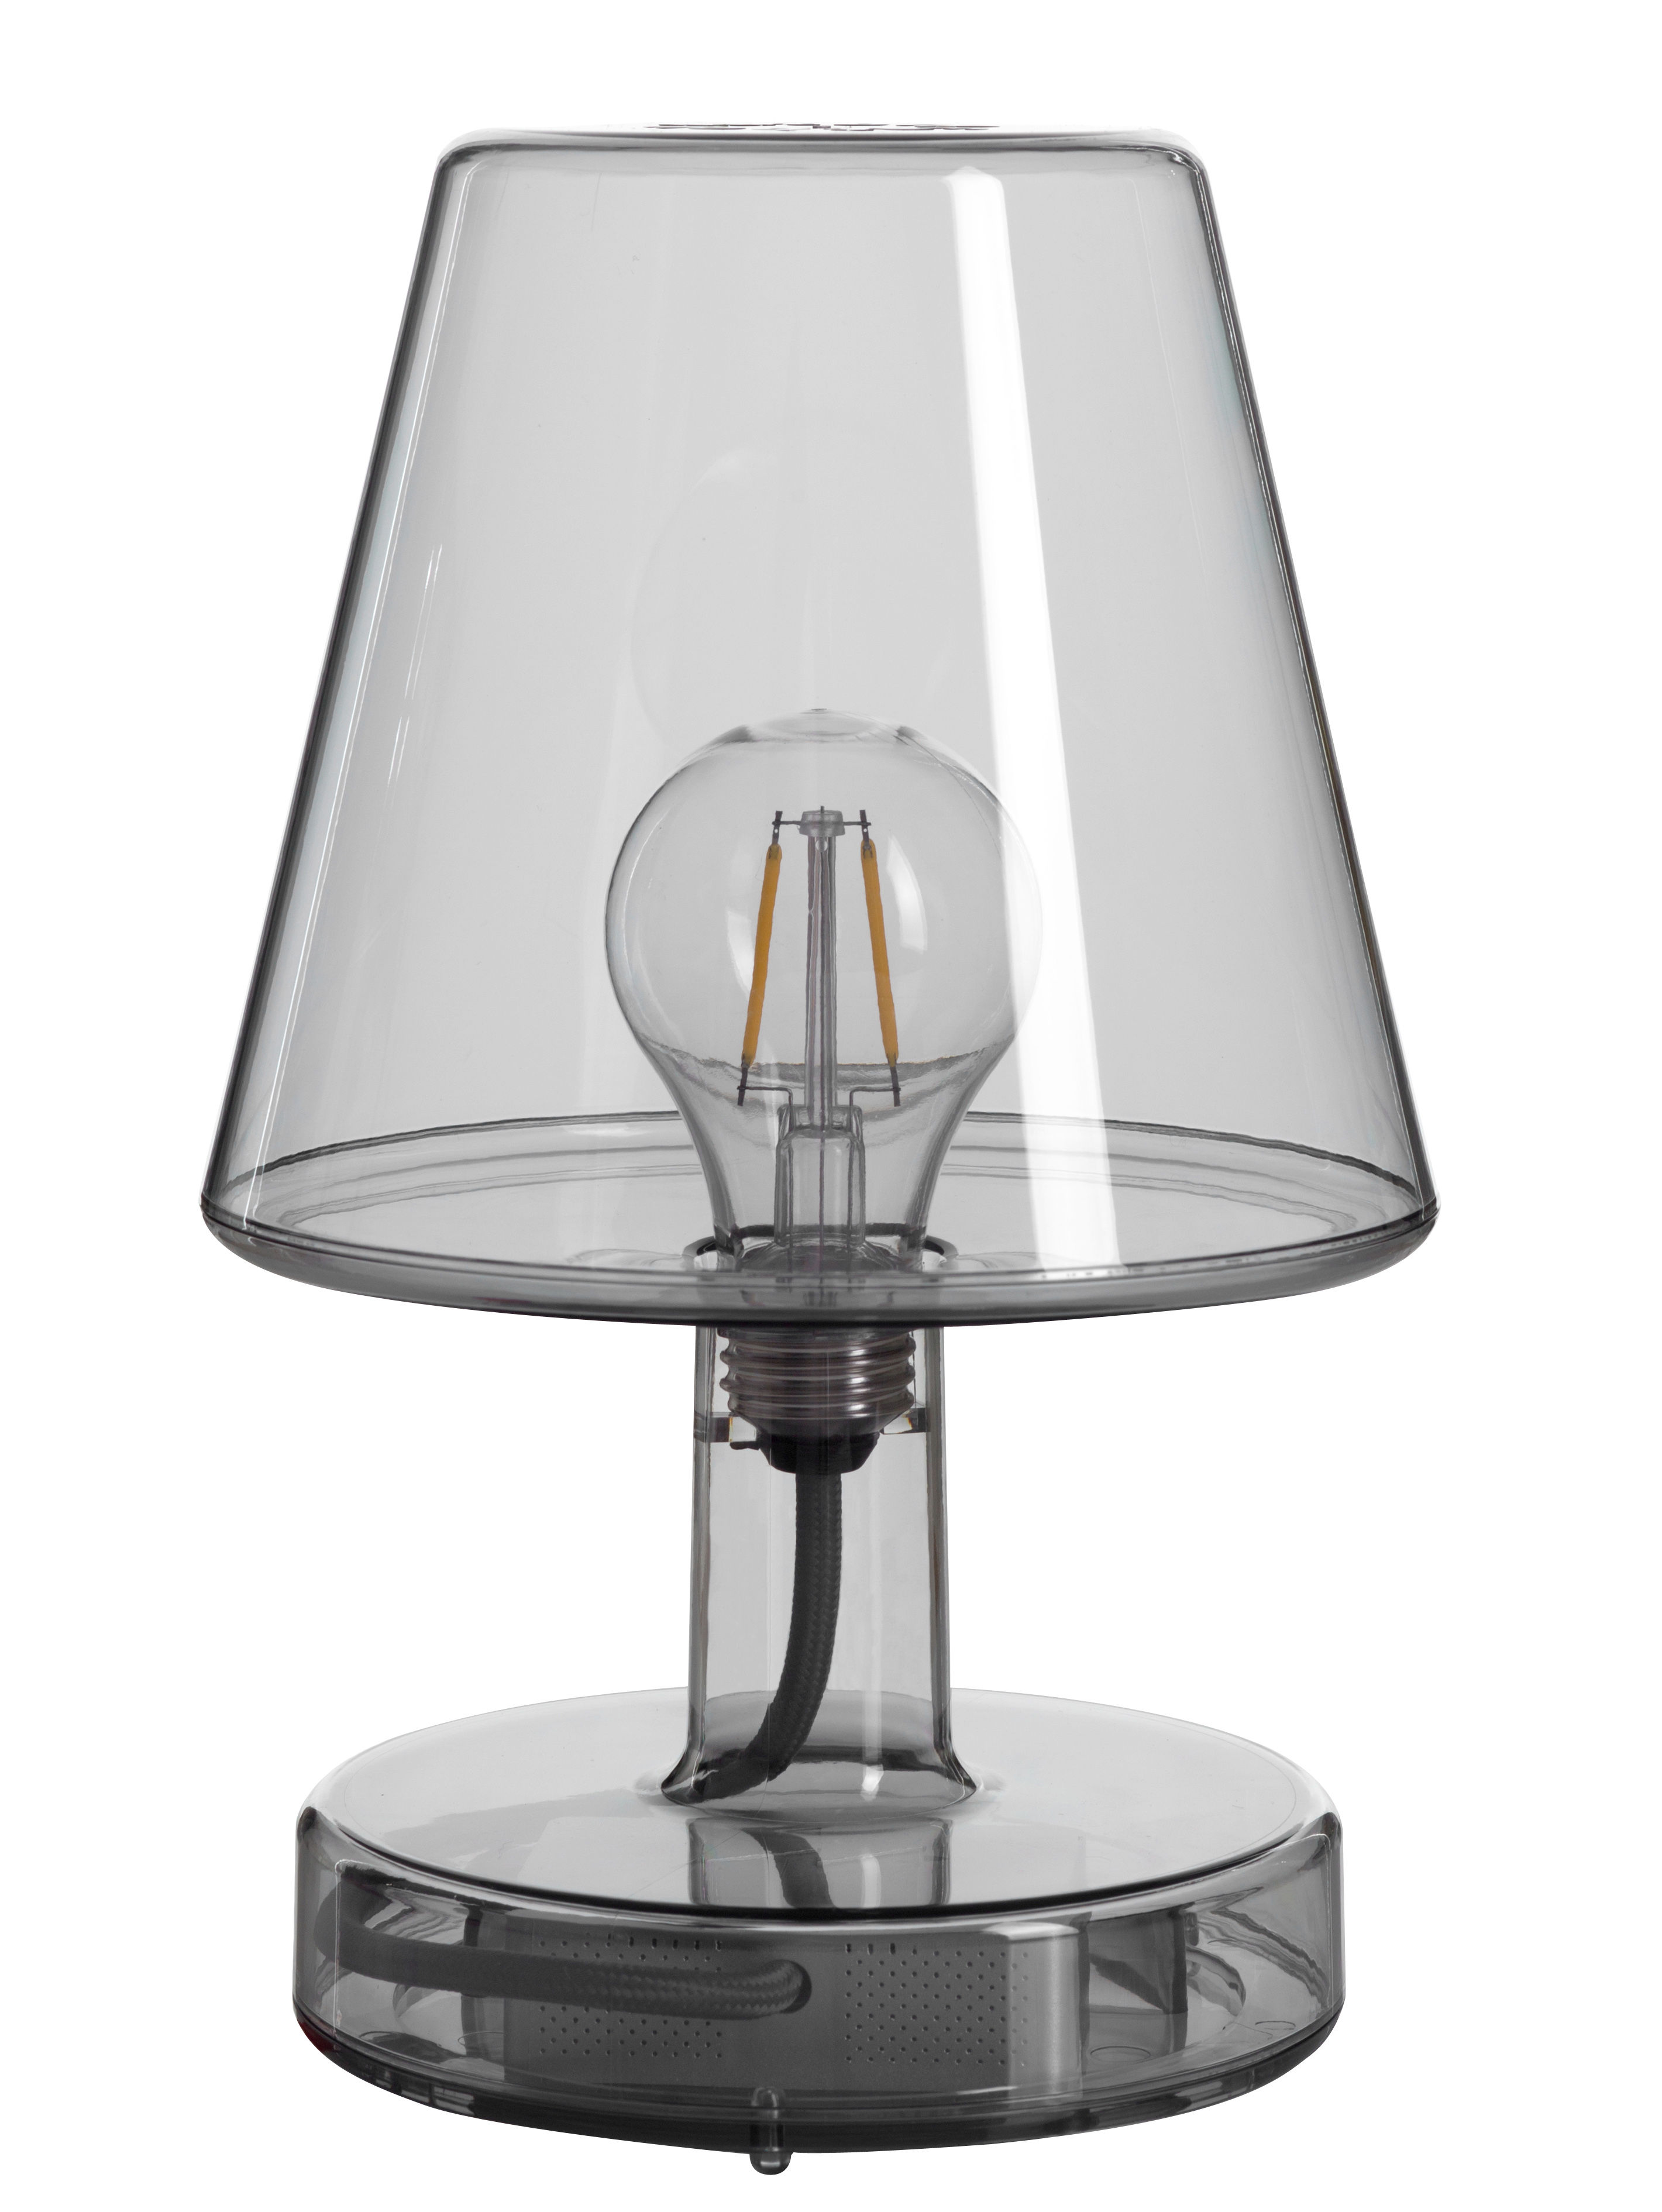 Lampe Ohne Kabel Transloetje Von Fatboy Grau H 25 5 Made In Design